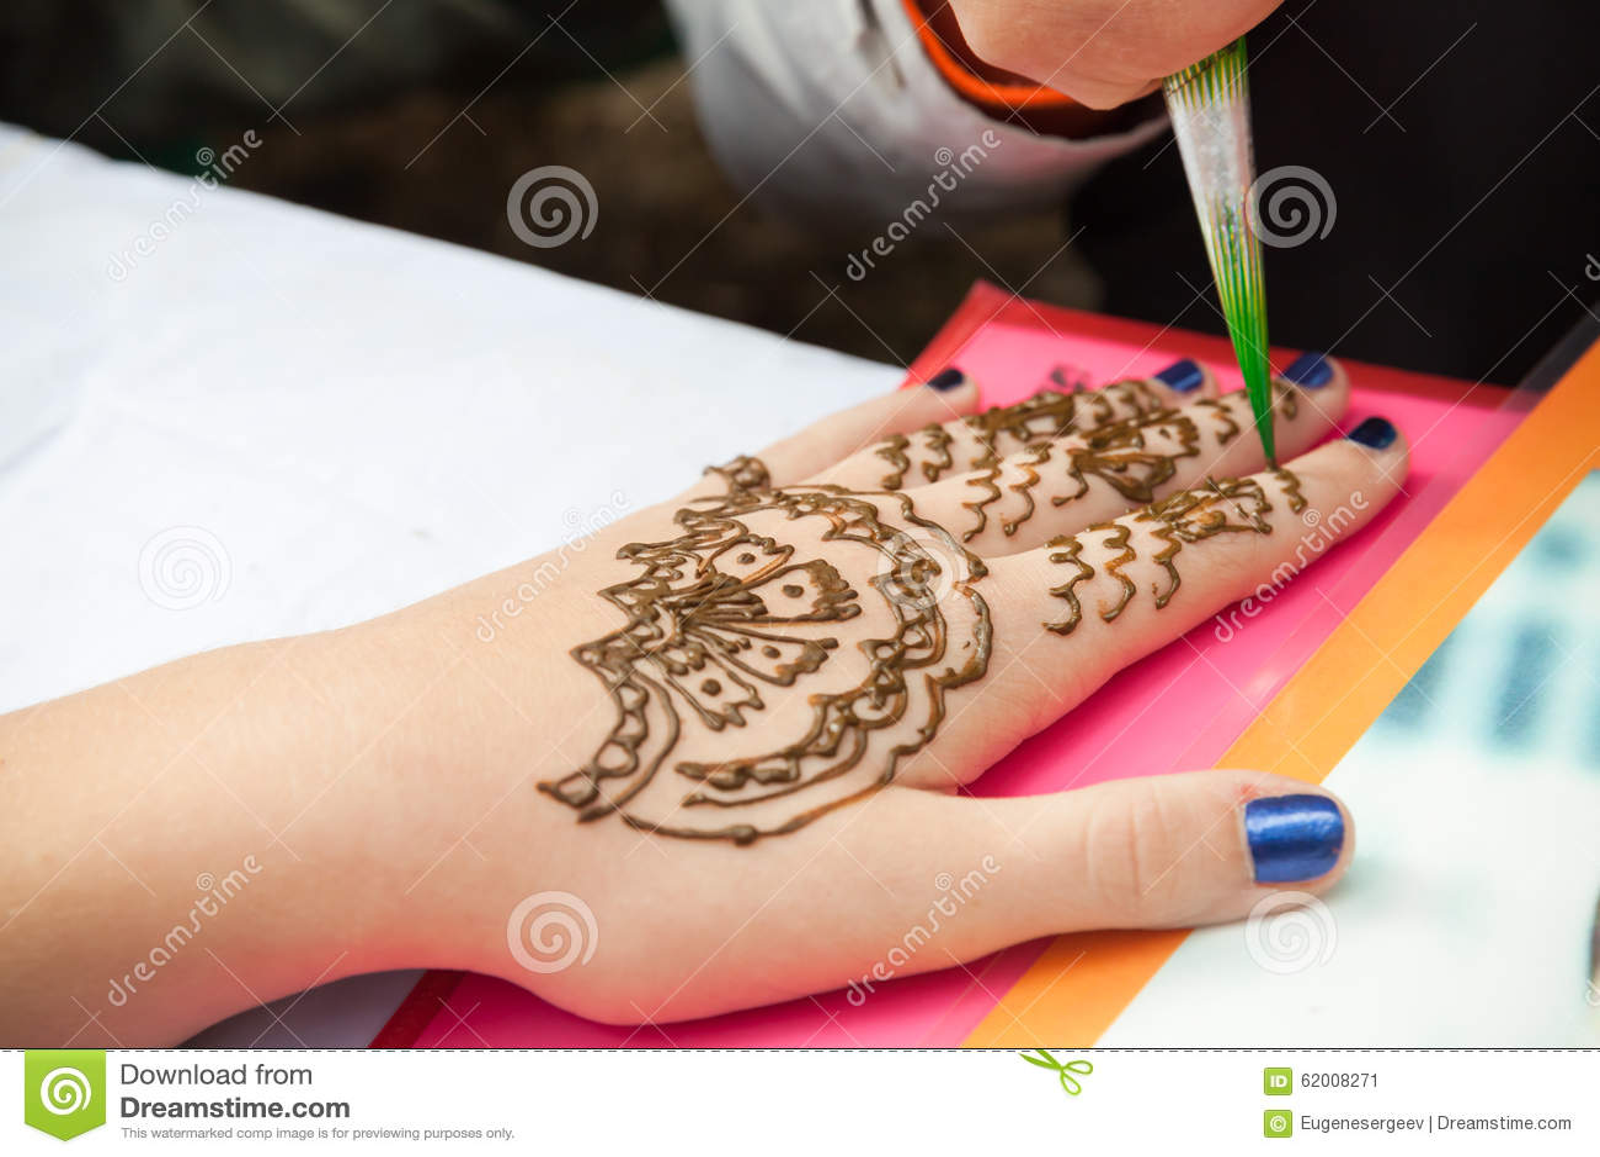 Mehndi Hand Decoration Games : Mehndi application on woman hand skin decoration